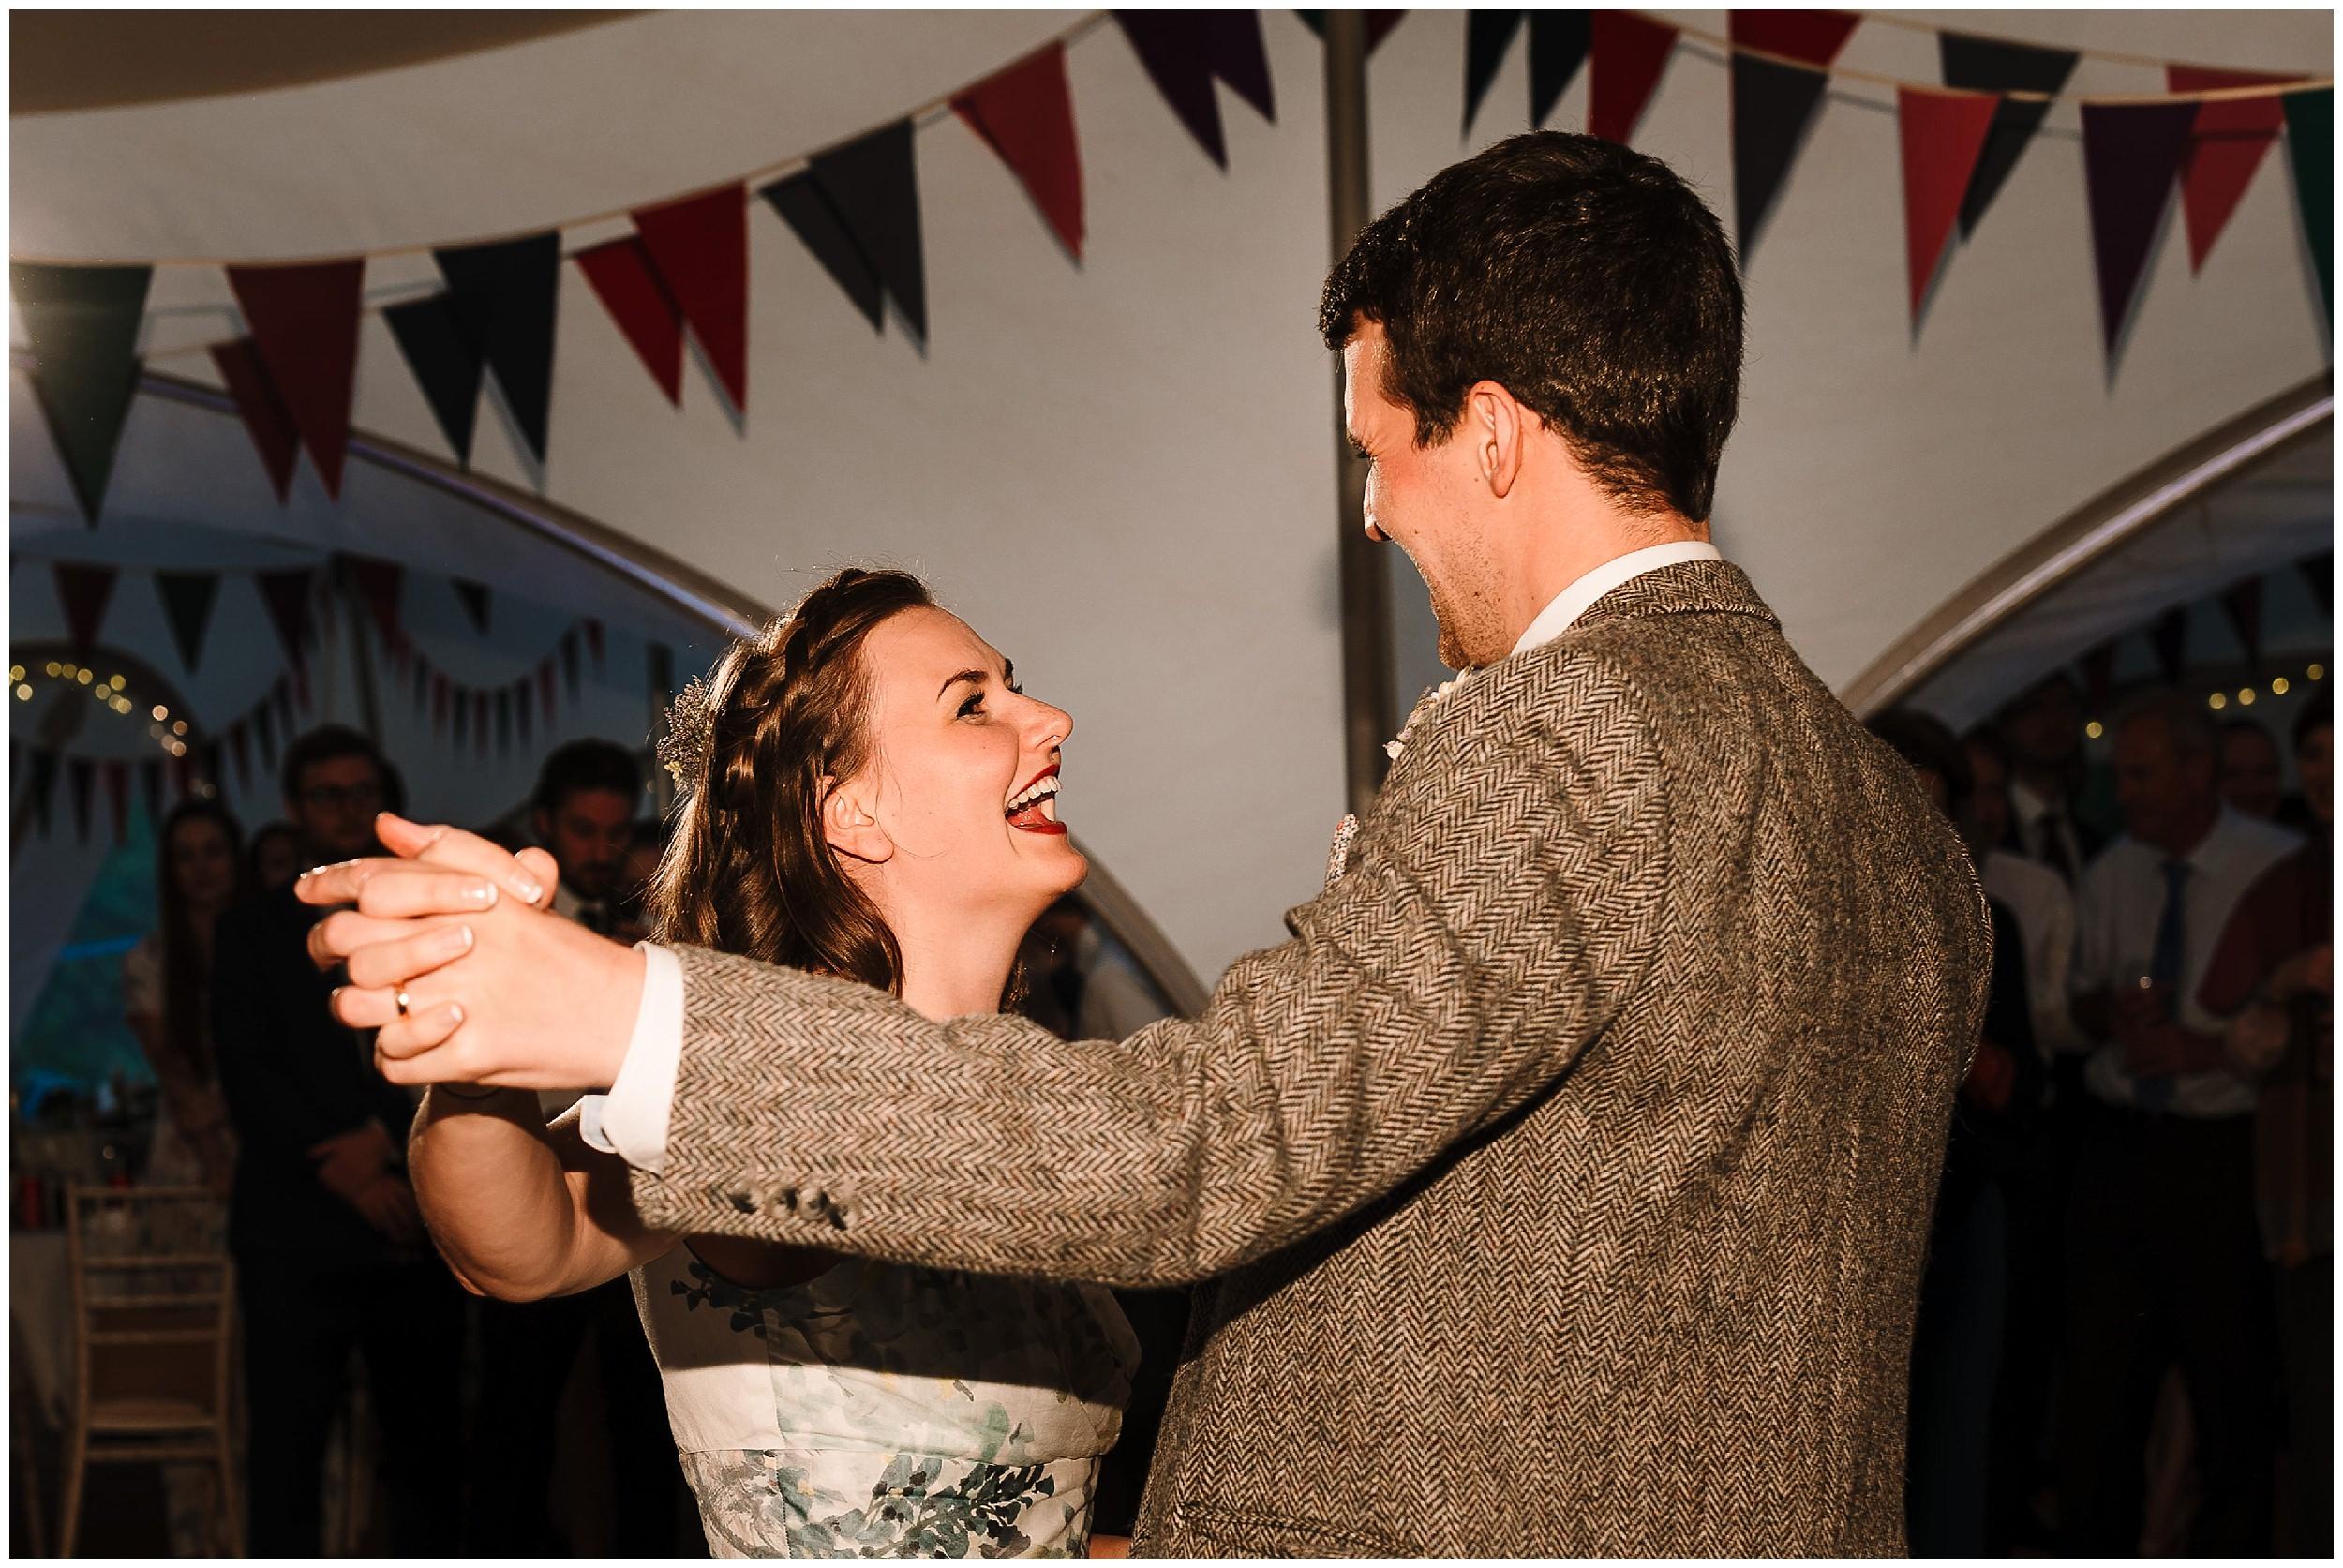 YORKSHIRE OUTDOOR WEDDING PHOTOGRAPHER LUCY ALEX_0038.jpg